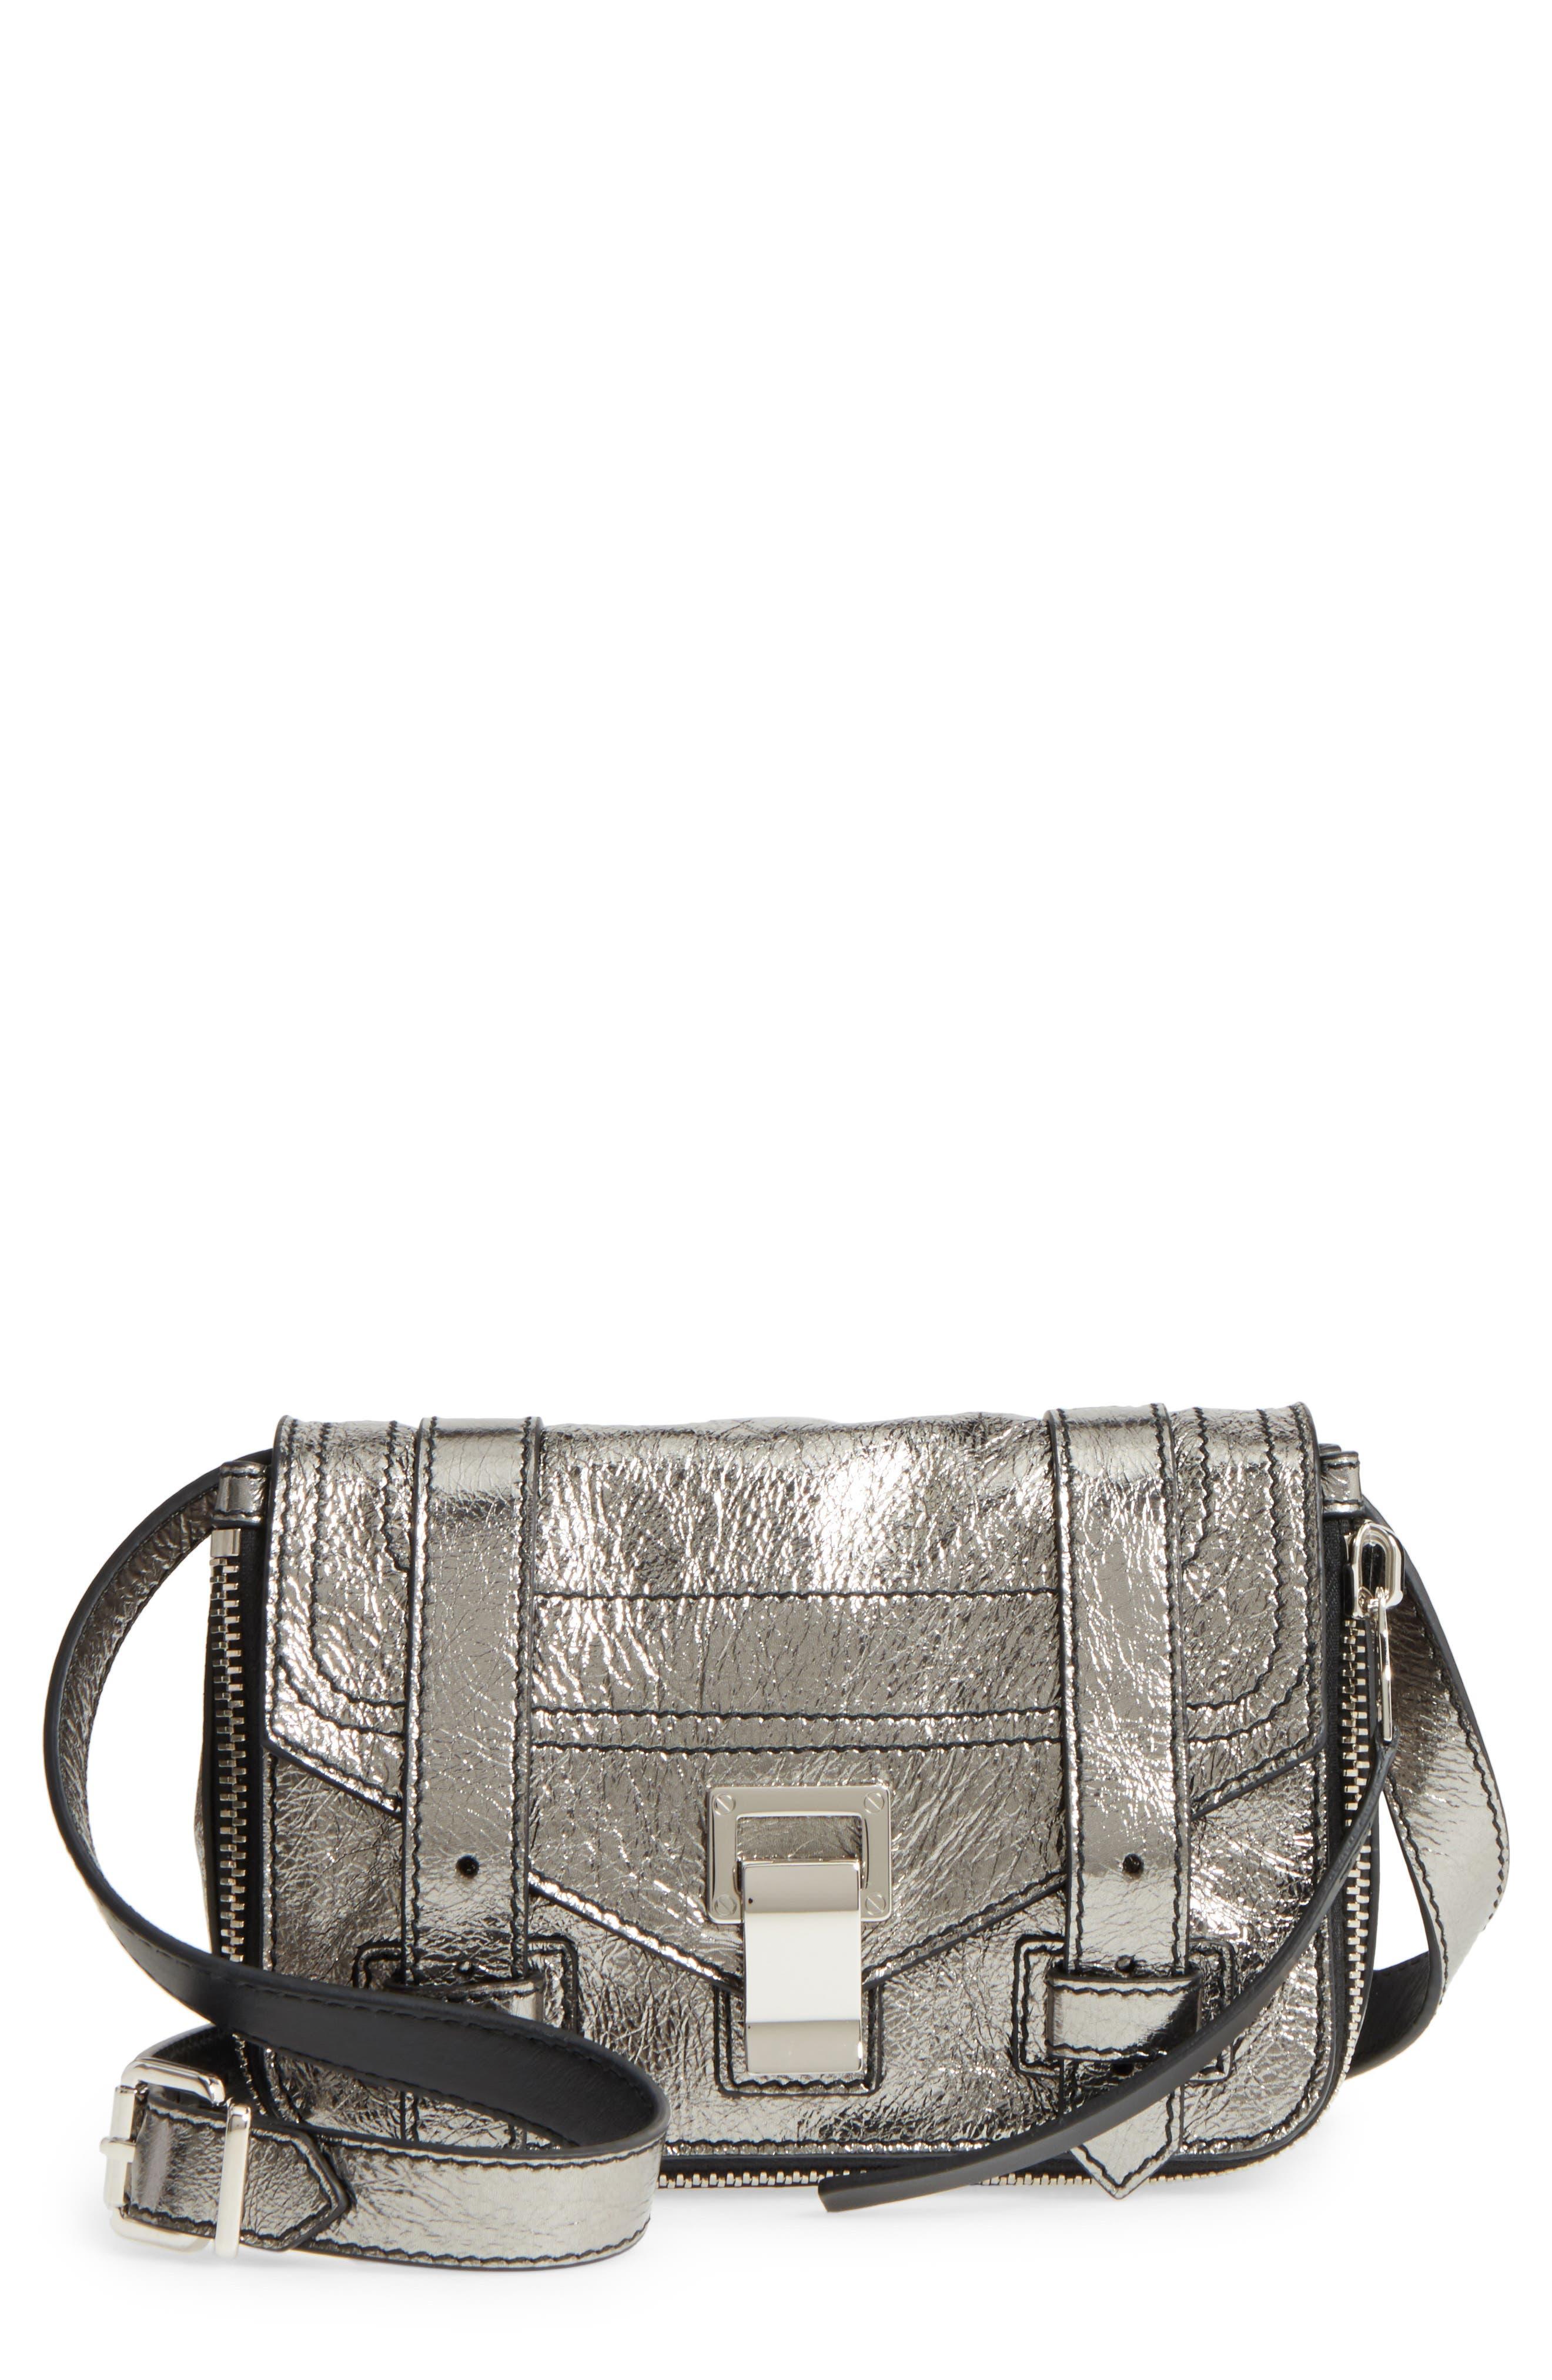 Mini PS1 Metallic Leather Crossbody Bag, Main, color, 040